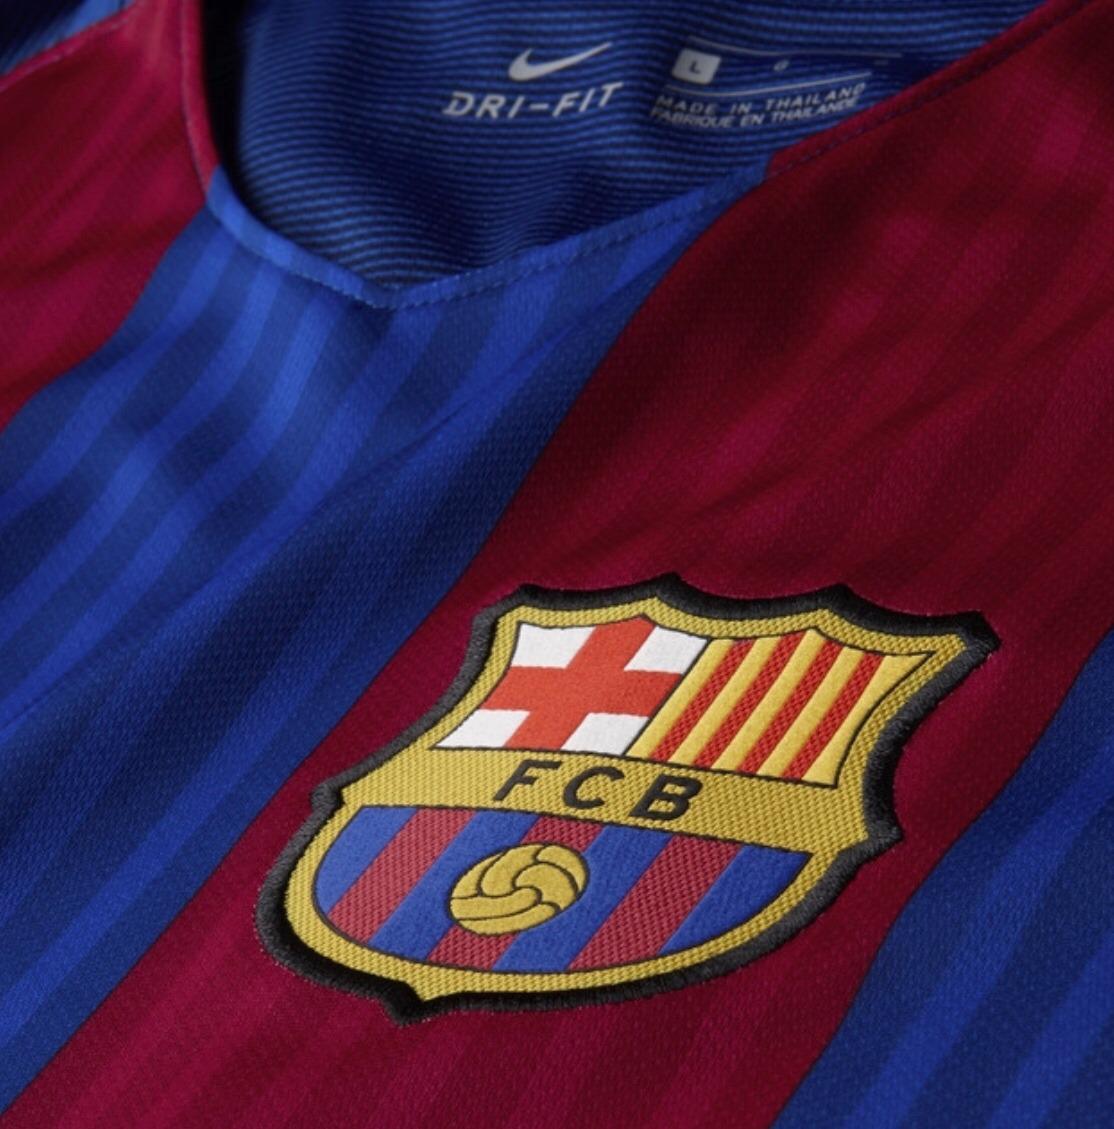 camiseta barcelona 2016-2017 original nike barca envío grati. Cargando zoom. 010d44a76f6